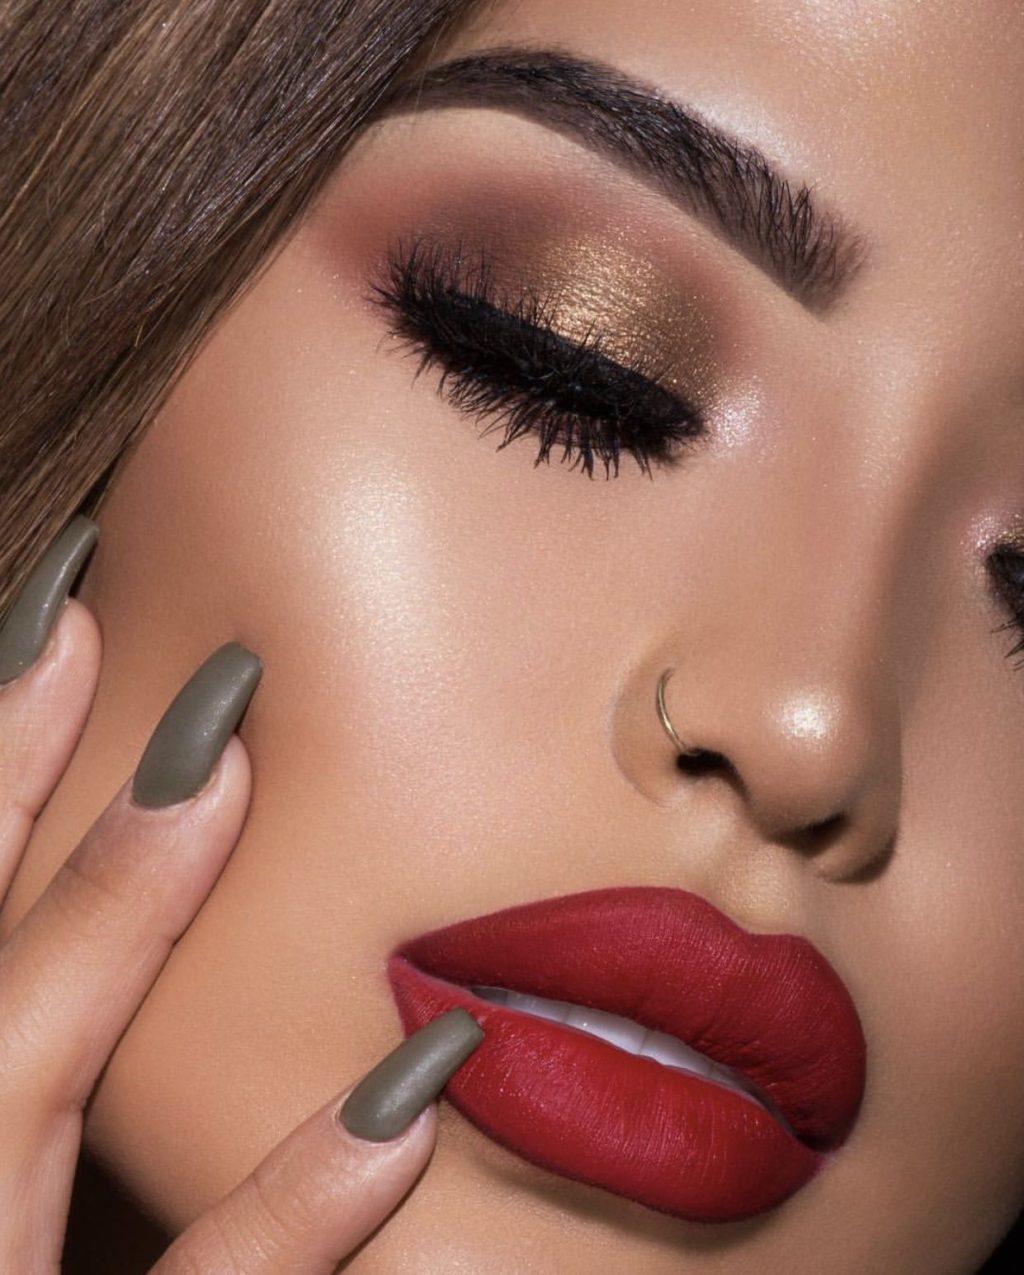 Golden-Smokey-Eye-make-up.-2-1024x1275 60+ Hottest Smokey Eye Makeup Looks in 2021